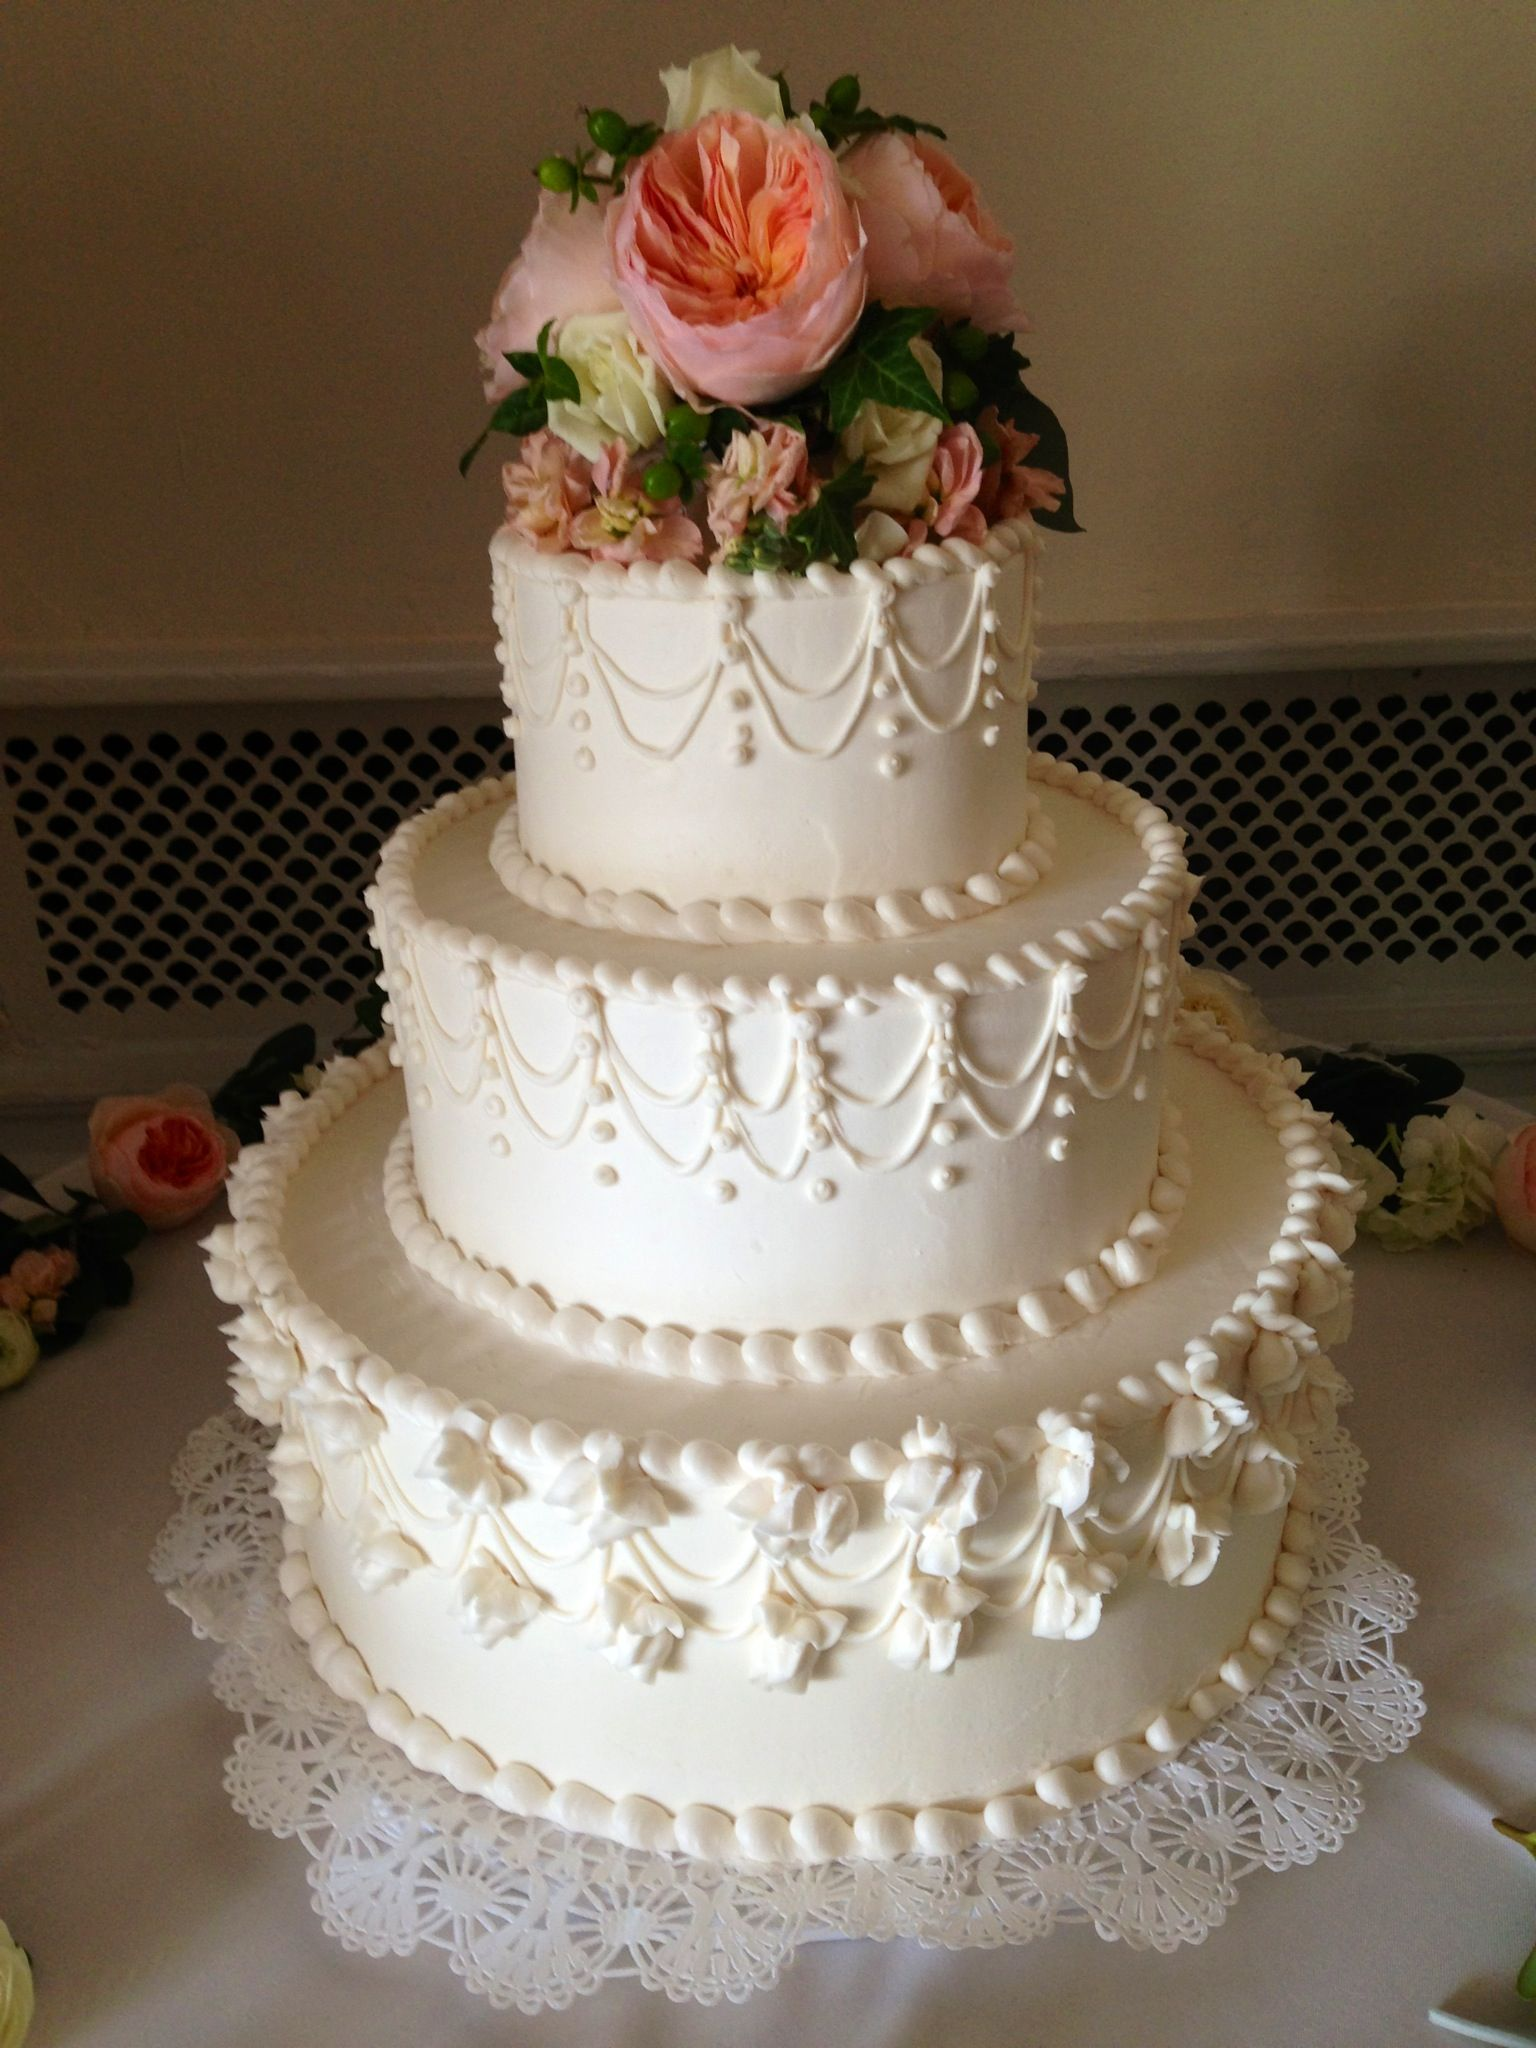 Traditional Wedding Cake in 2019 Wedding cake designs